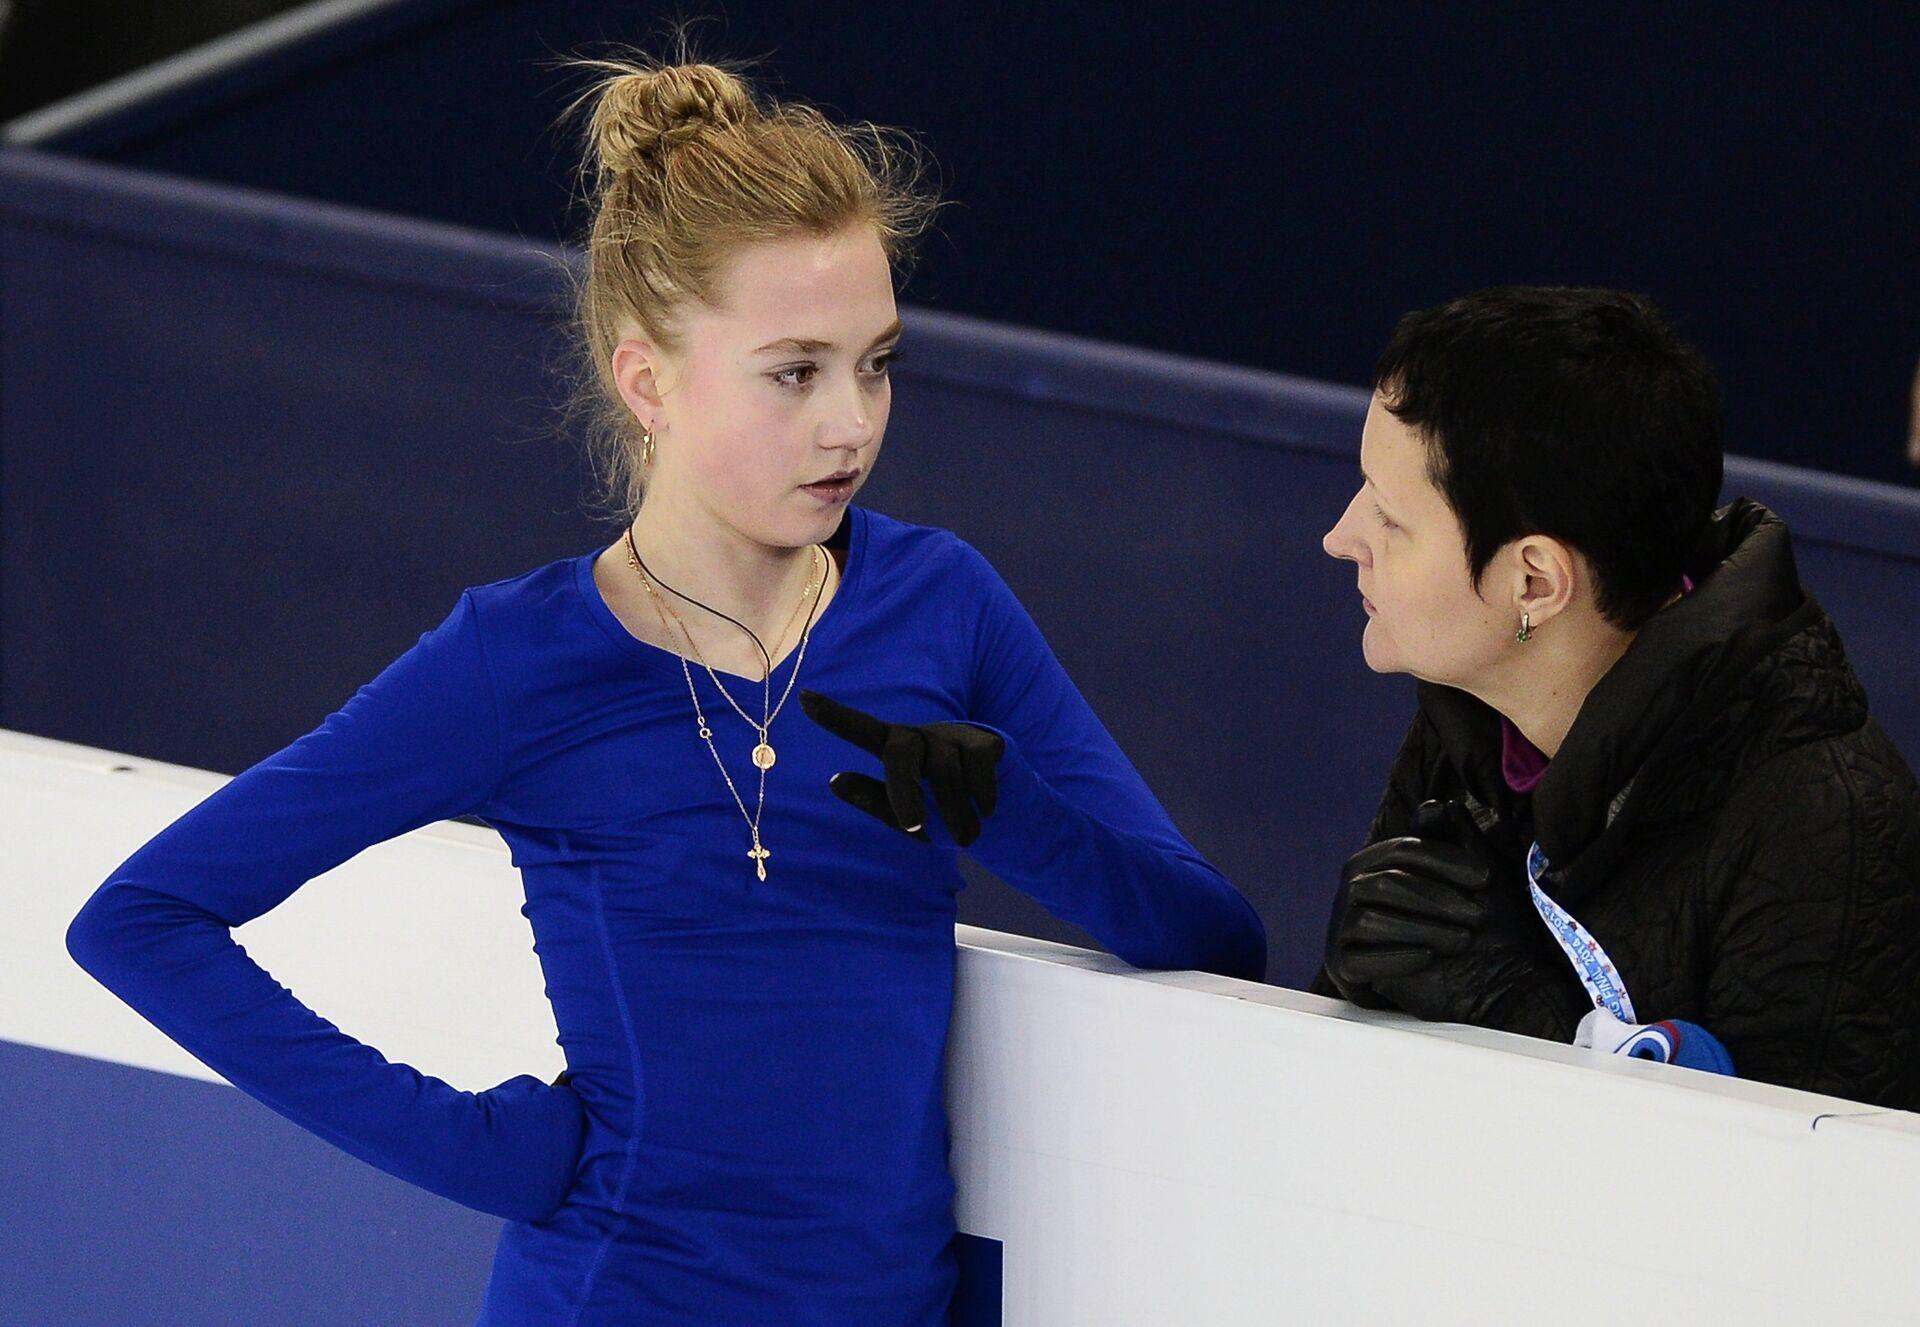 Слева направо: Елена Радионова (Россия) и тренер Инна Гончаренко - РИА Новости, 1920, 22.09.2020